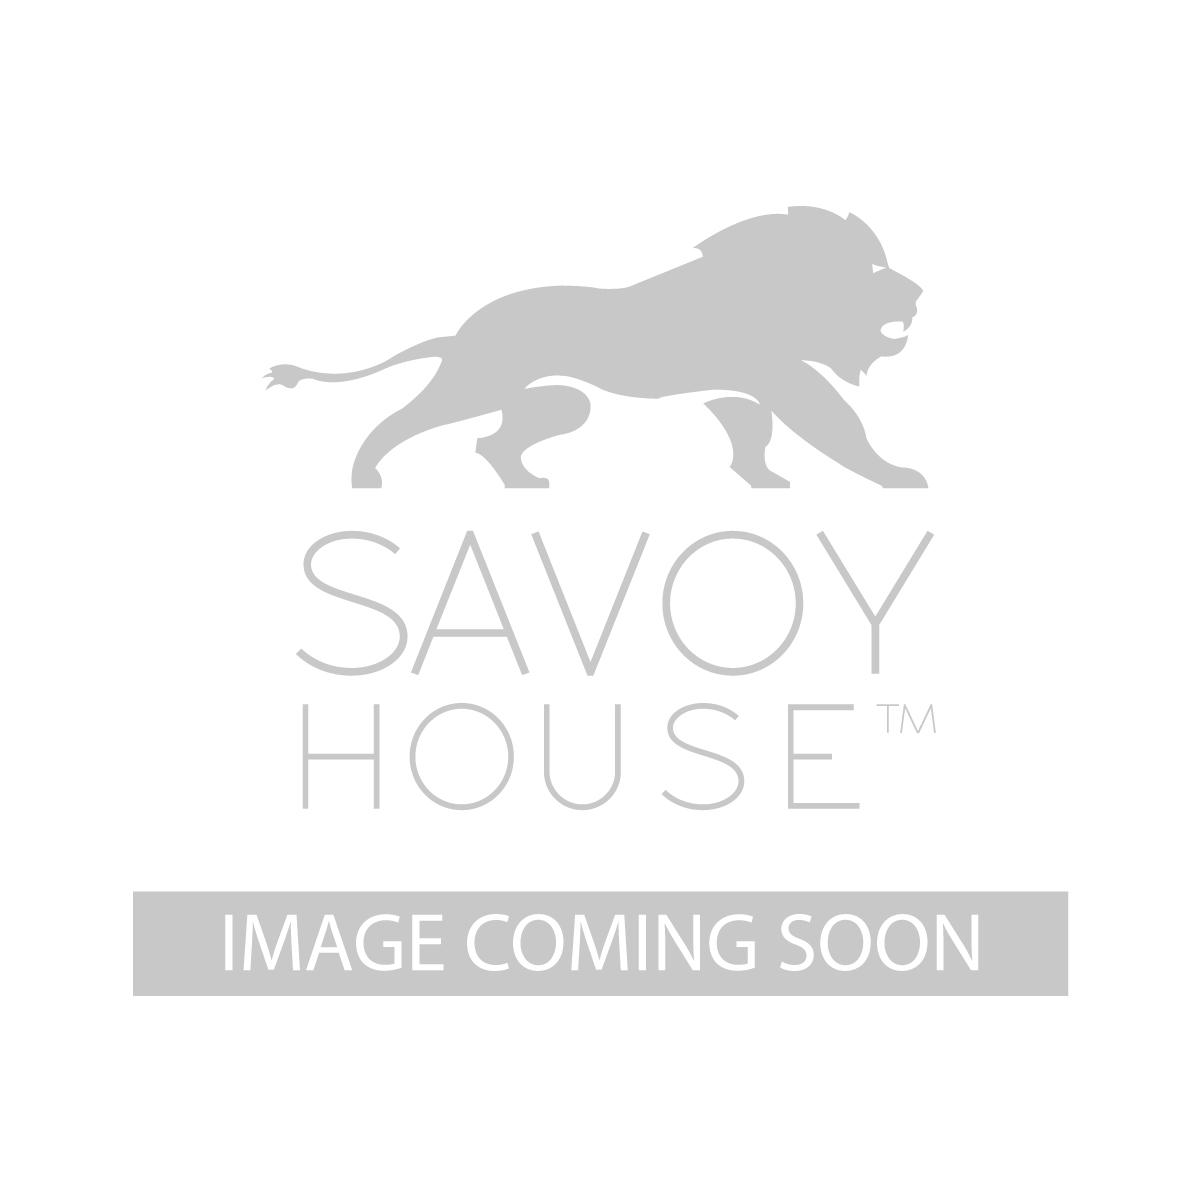 4 light bath bar foster melrose light bath bar 86836411 by savoy house